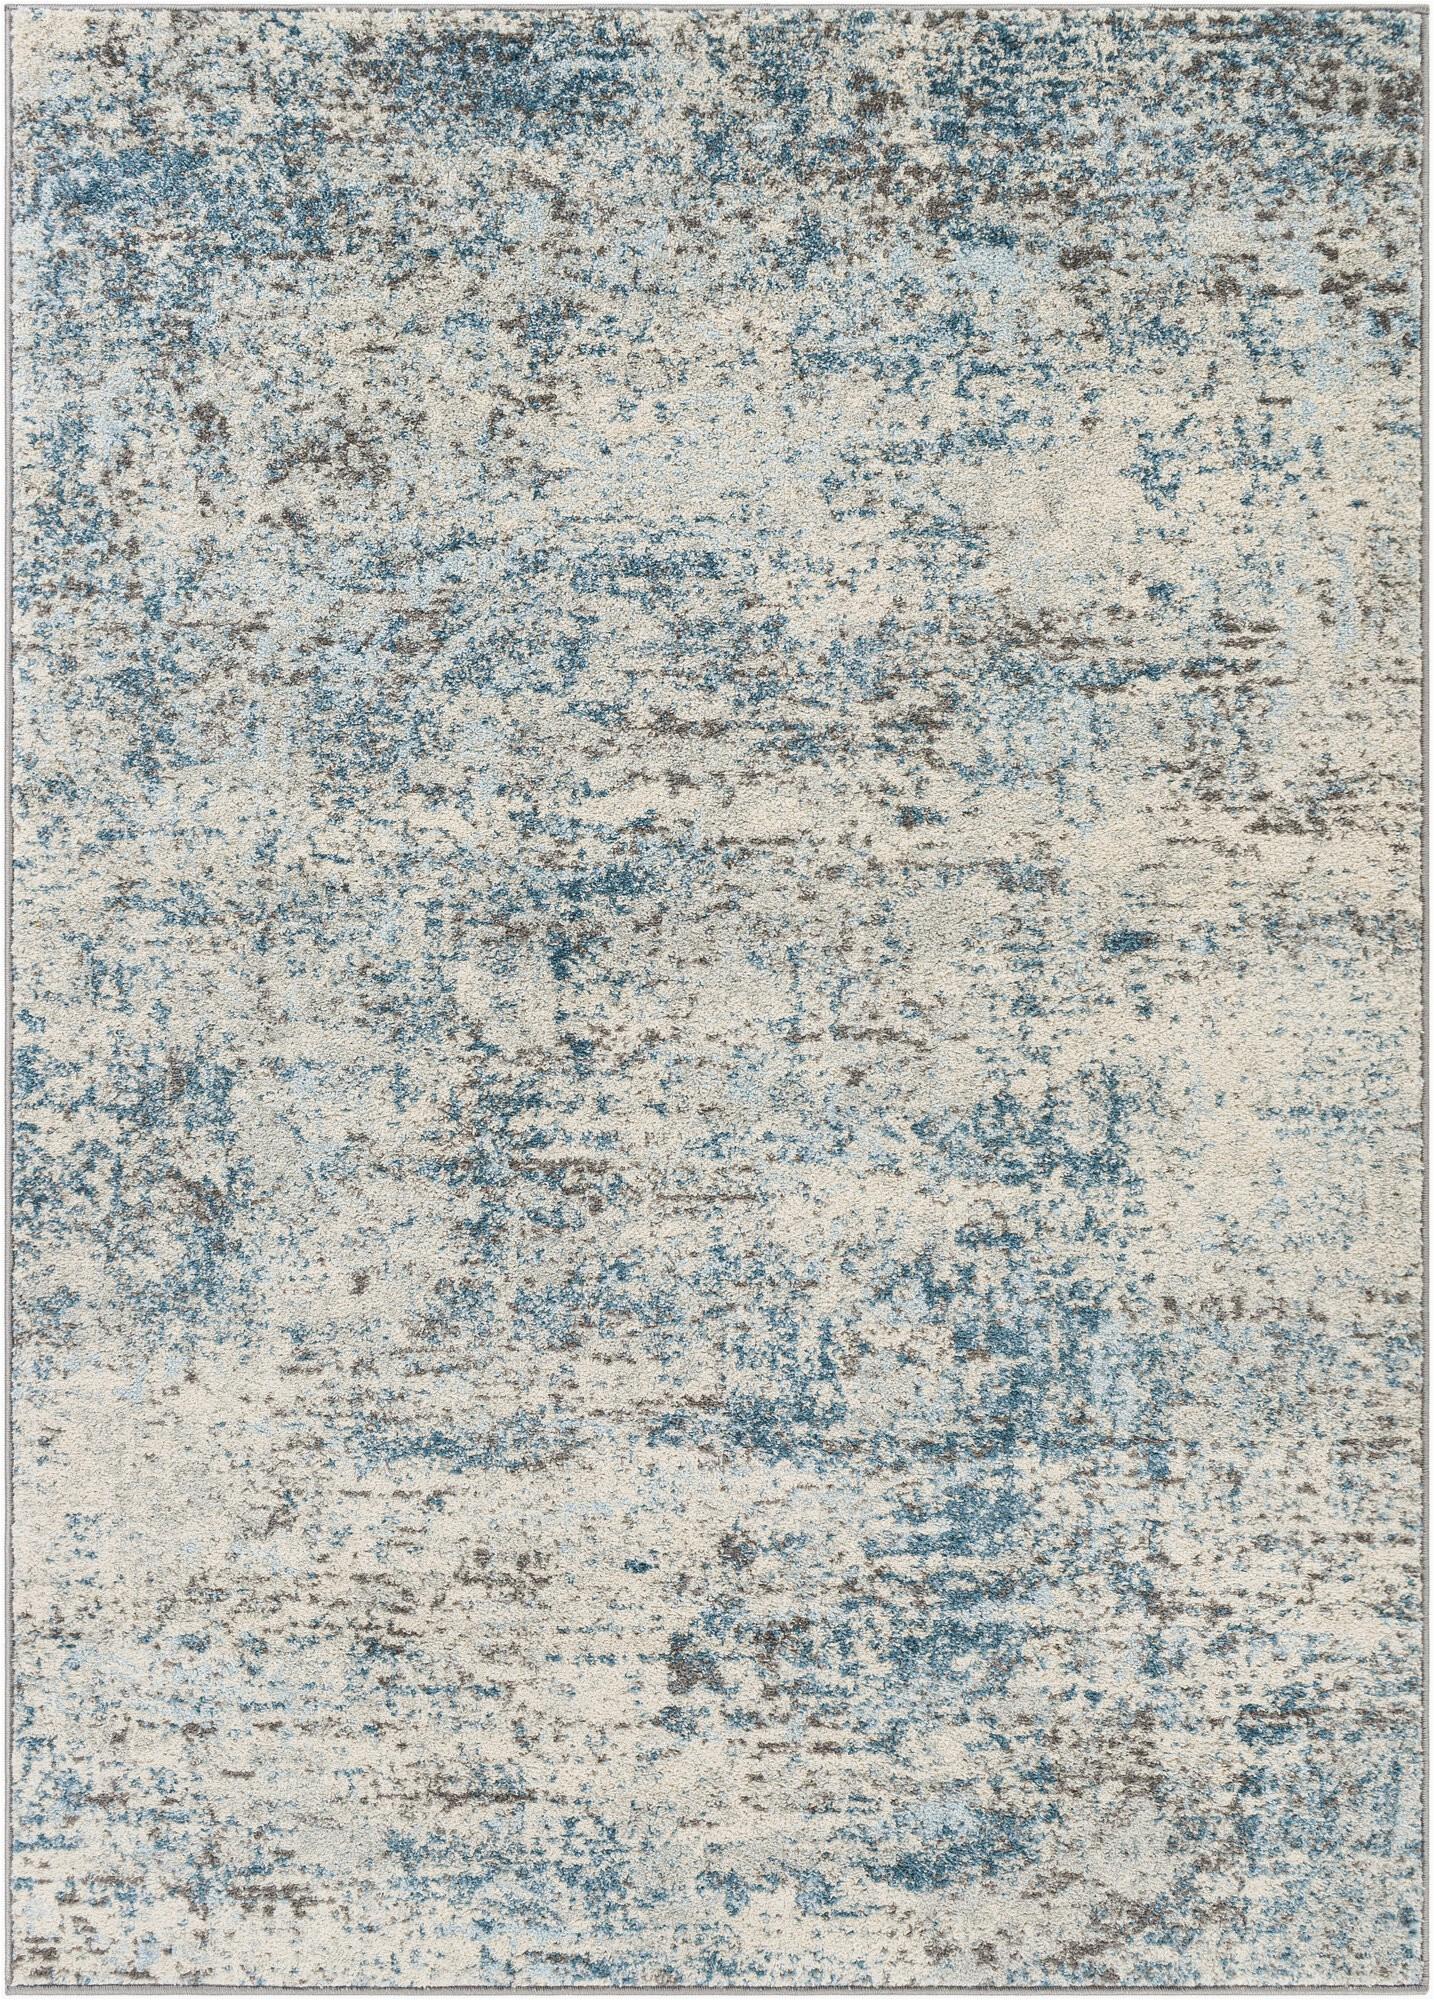 hawkesbury mon power loom tealcream rug